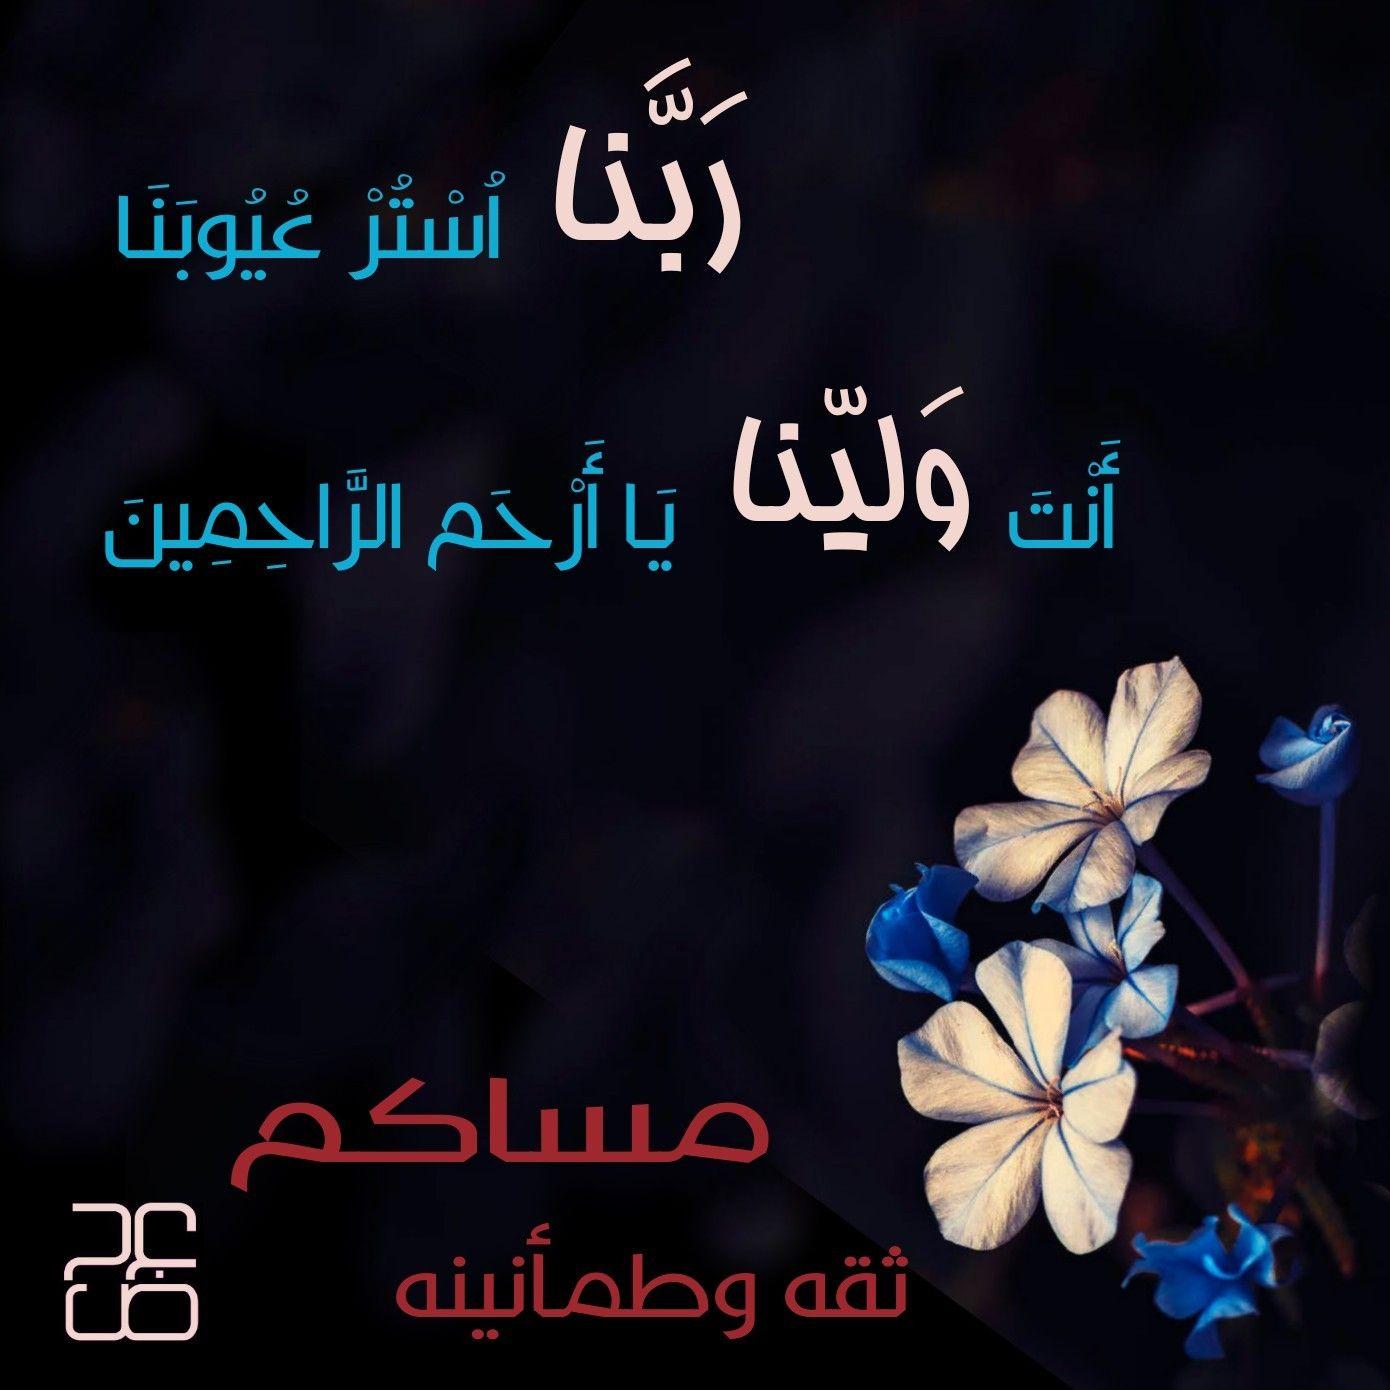 أنت ولينا يا ارحم الراحمين Poster Movie Posters Movies